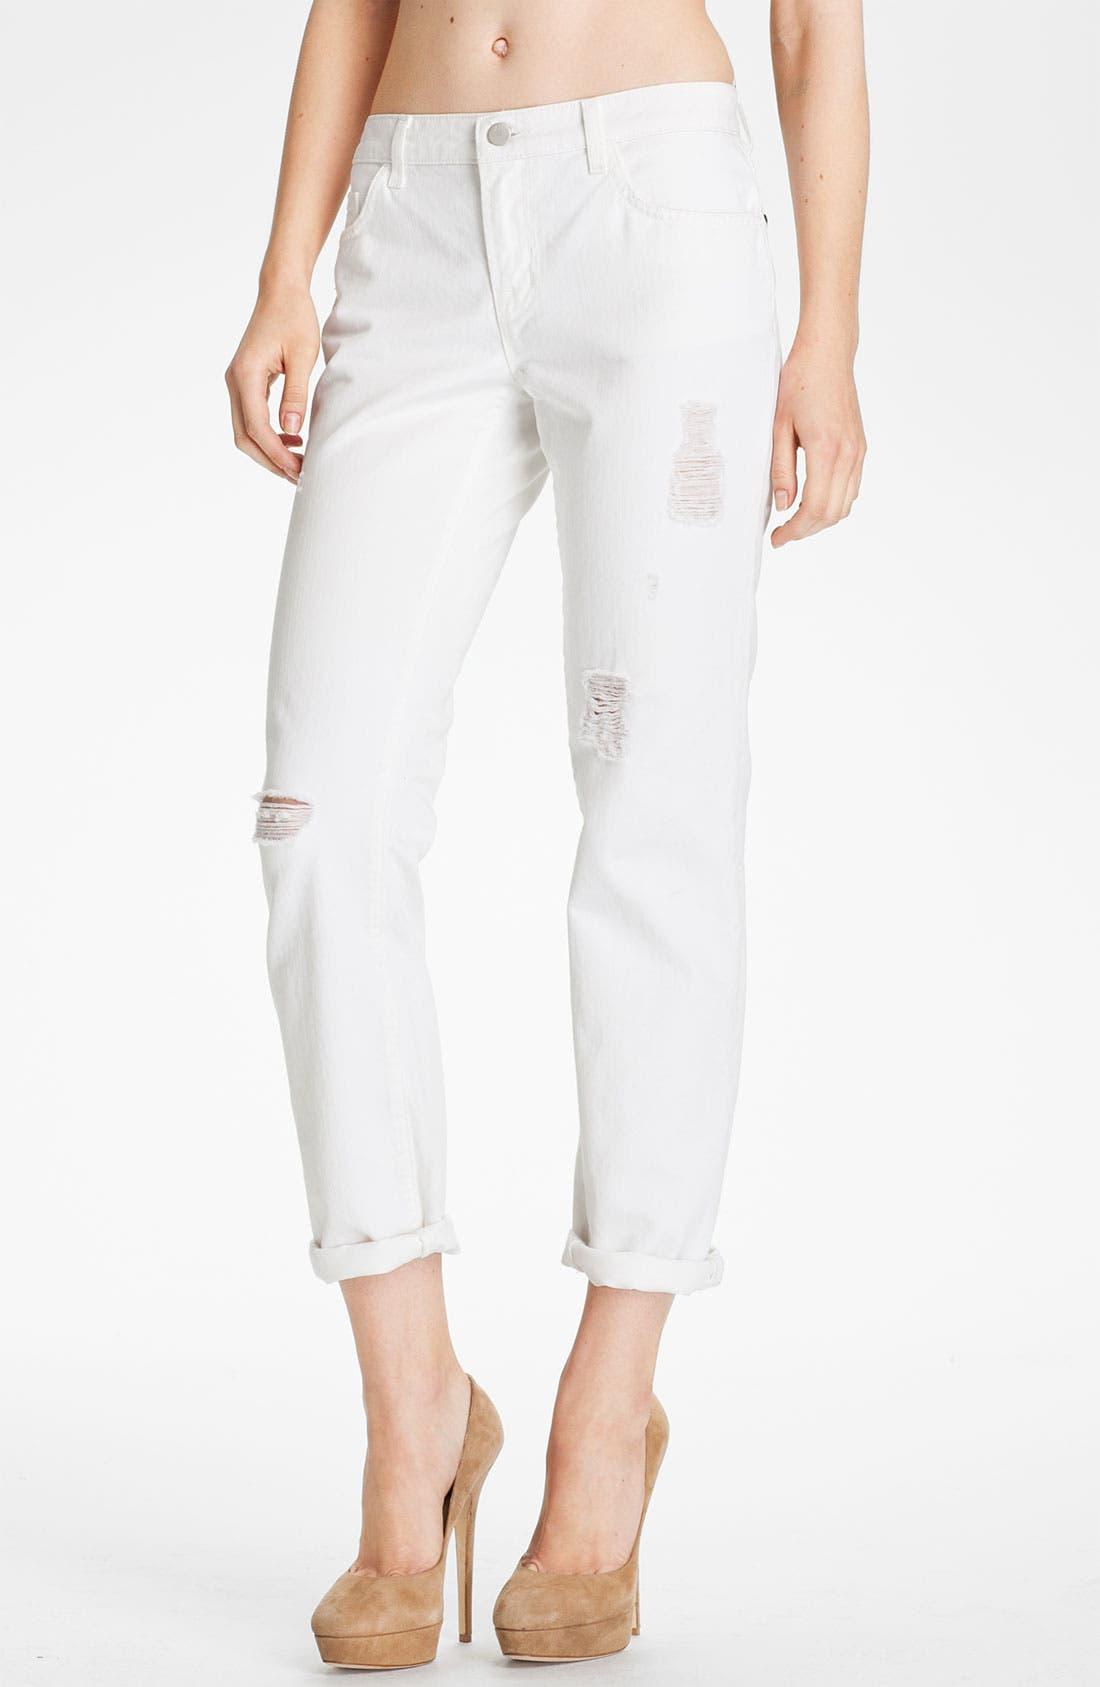 Alternate Image 1 Selected - J Brand 'Aidan' Distressed Boyfriend Fit Jeans (White Destructed)